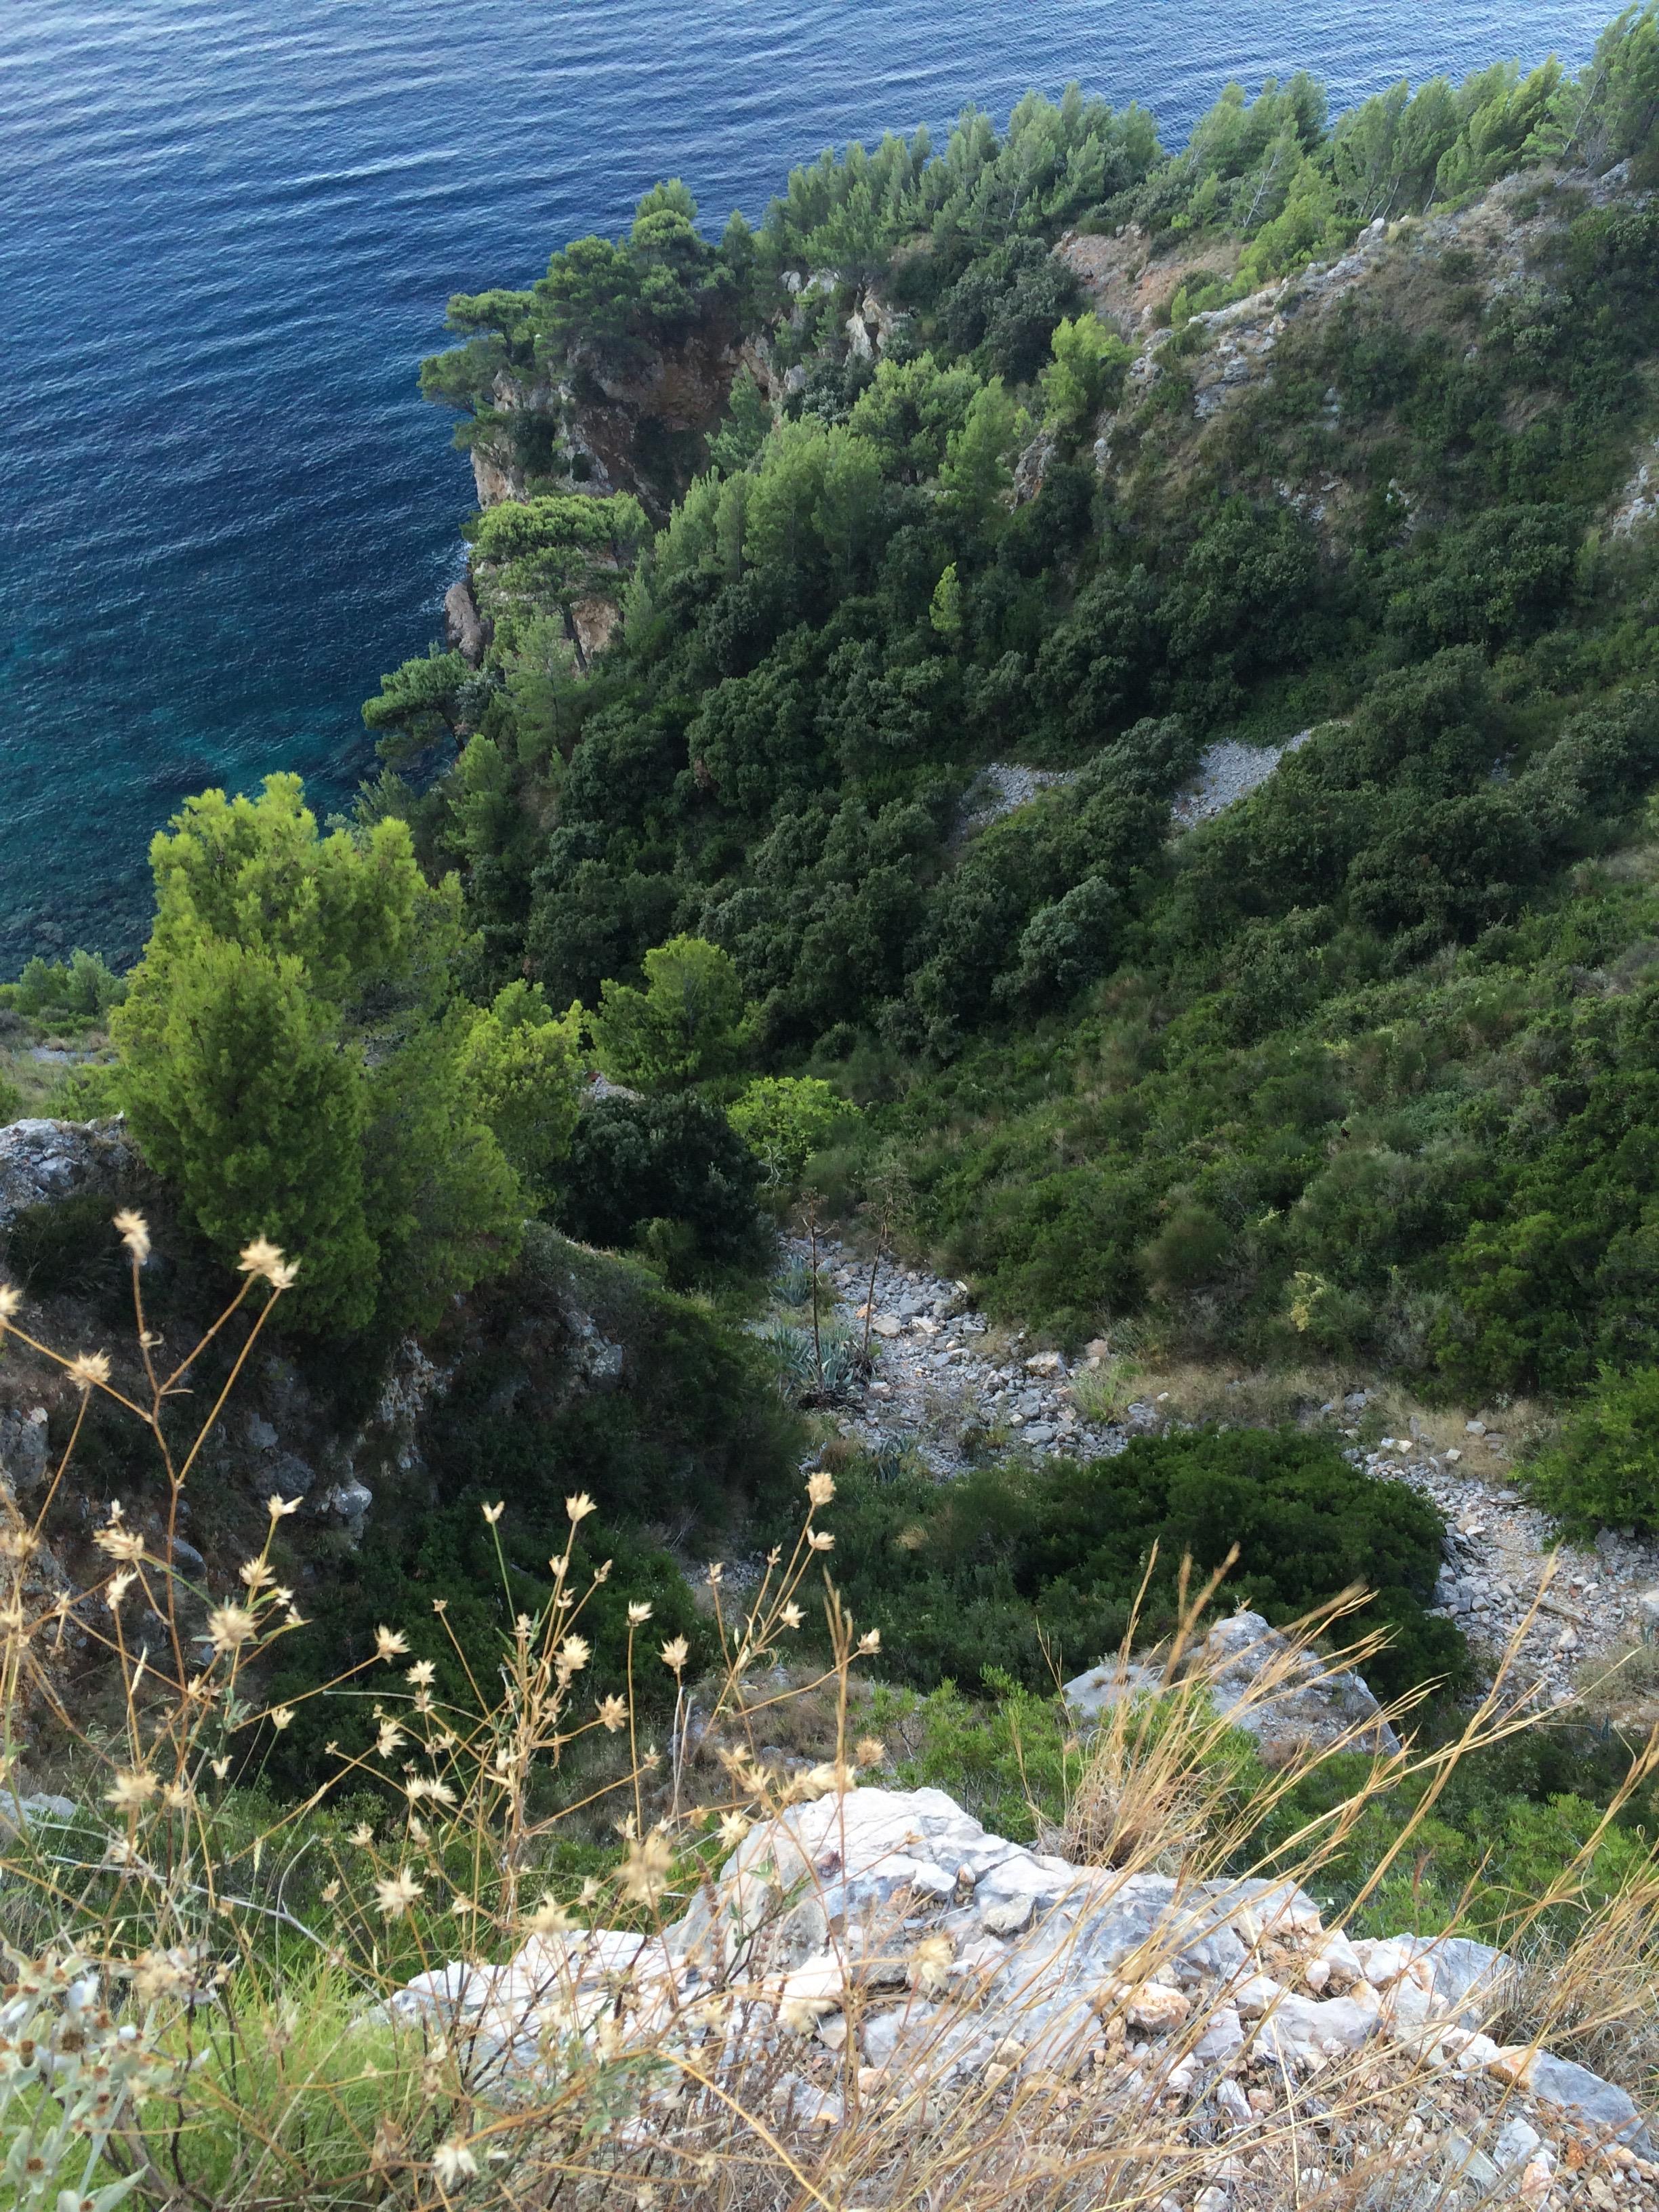 Hillside of Park Orsula, Dubrovnik, Croatia.